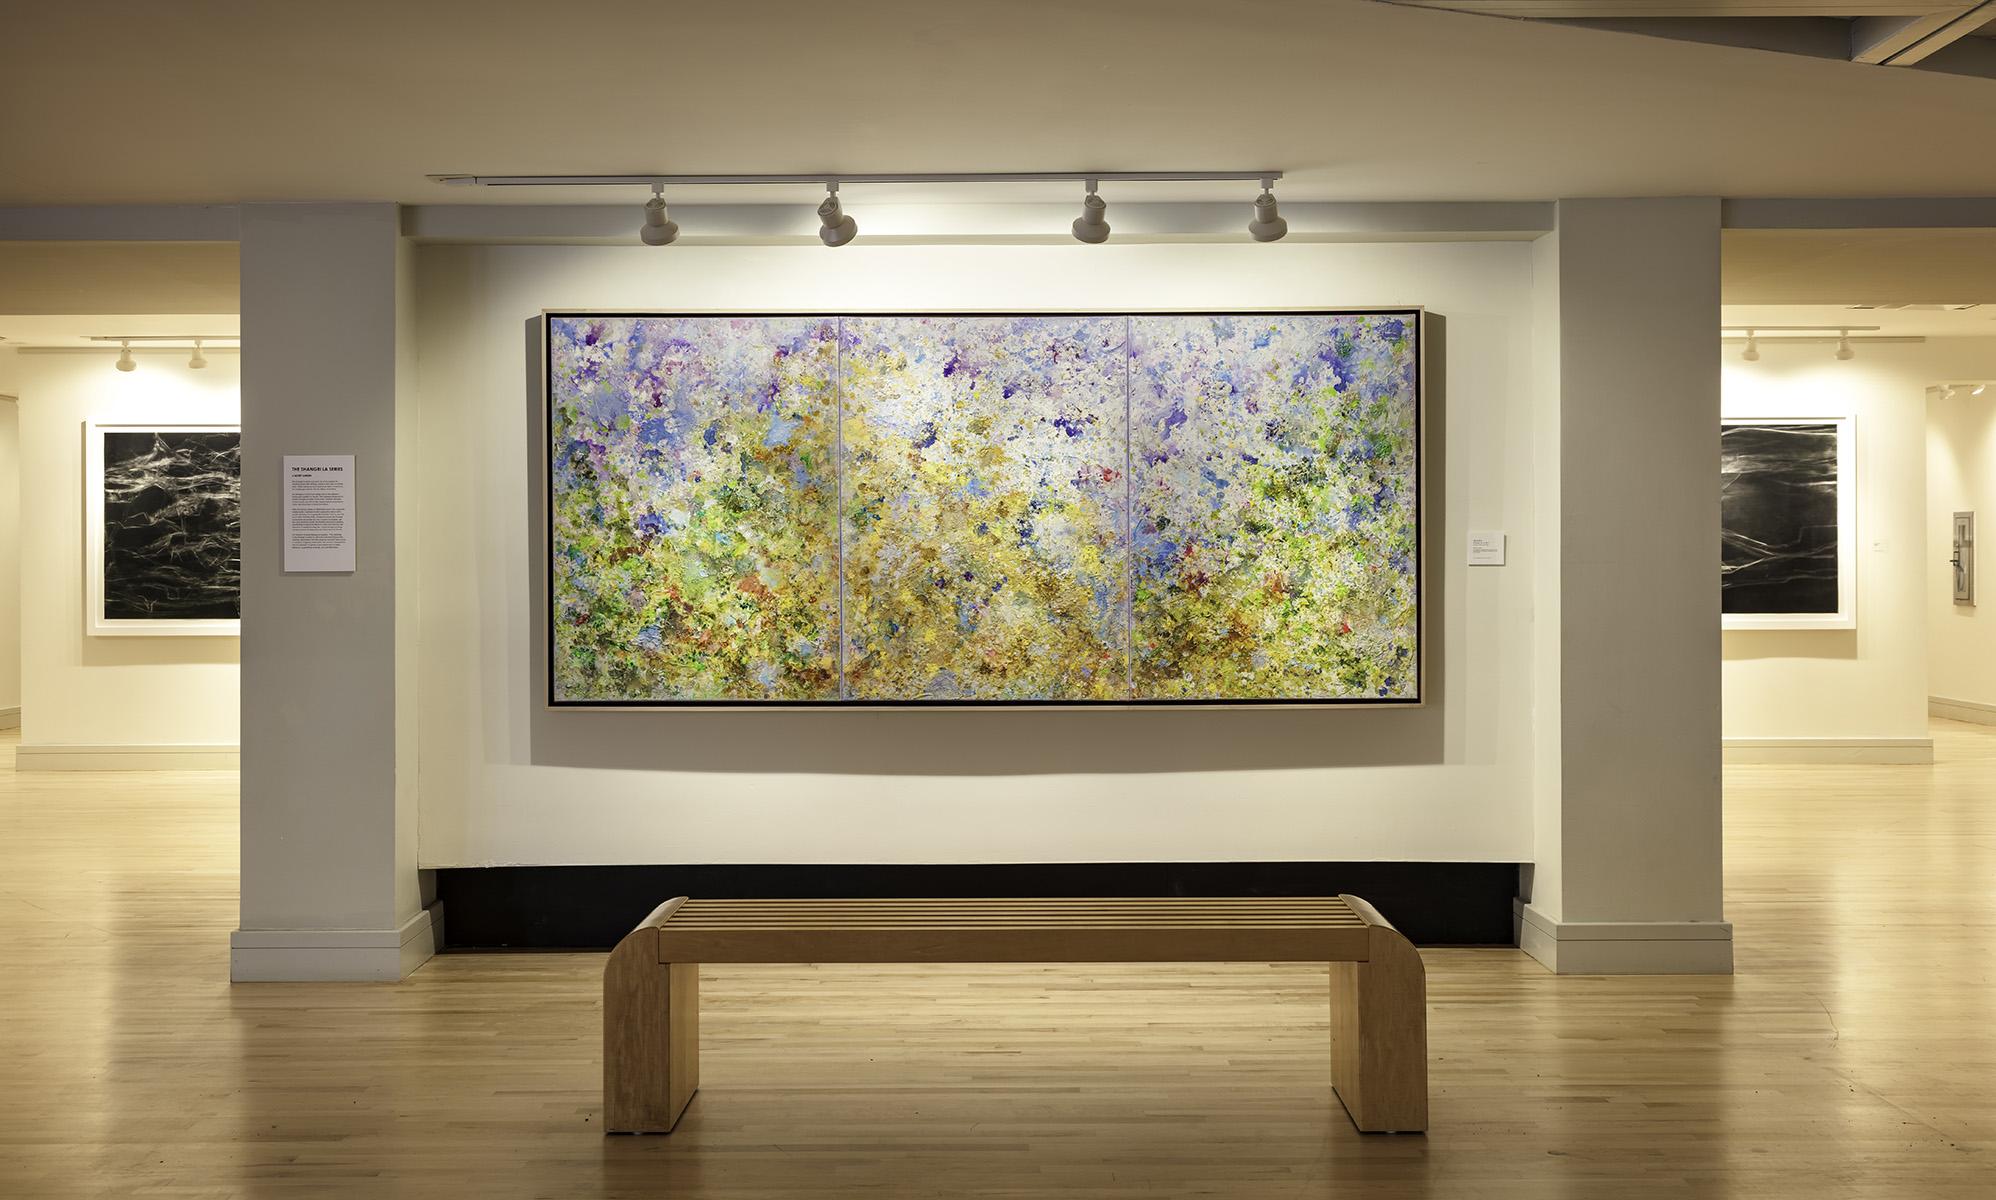 20190318_CoralSpringsMuseum_Krutick_F015 web.jpg